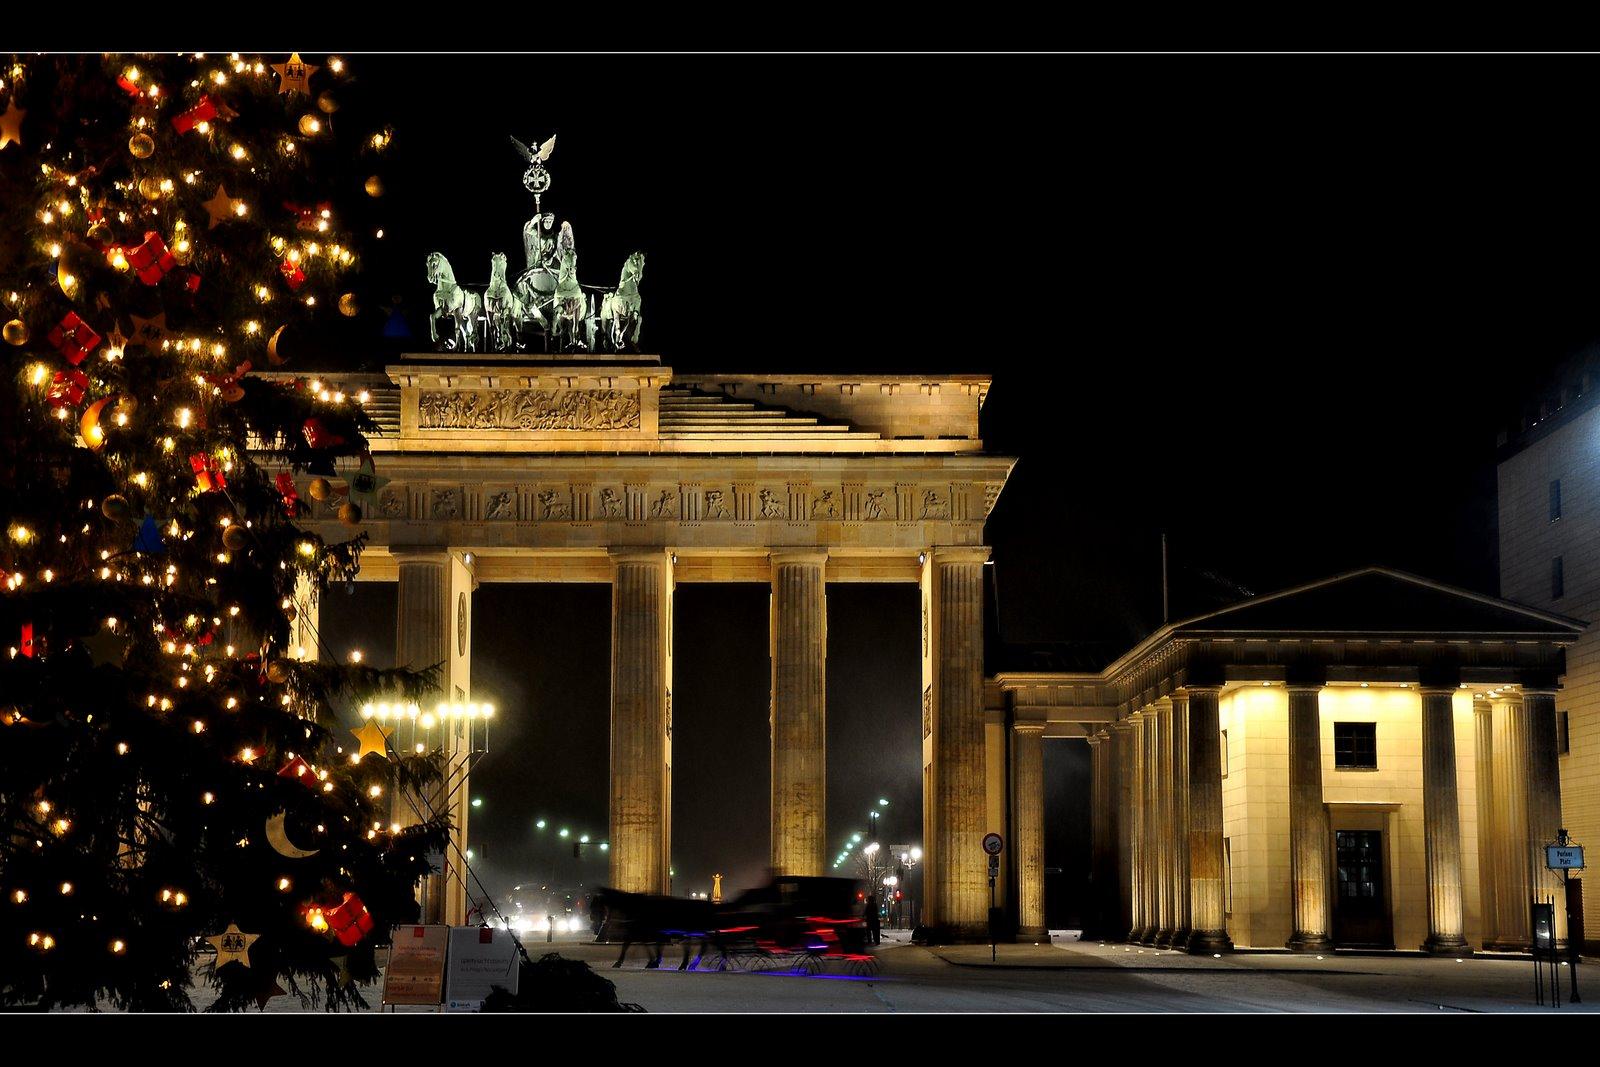 Frohe Weihnachten Berlin.Frohe Weihnachten Berlin Foto Bild Architektur Architektur